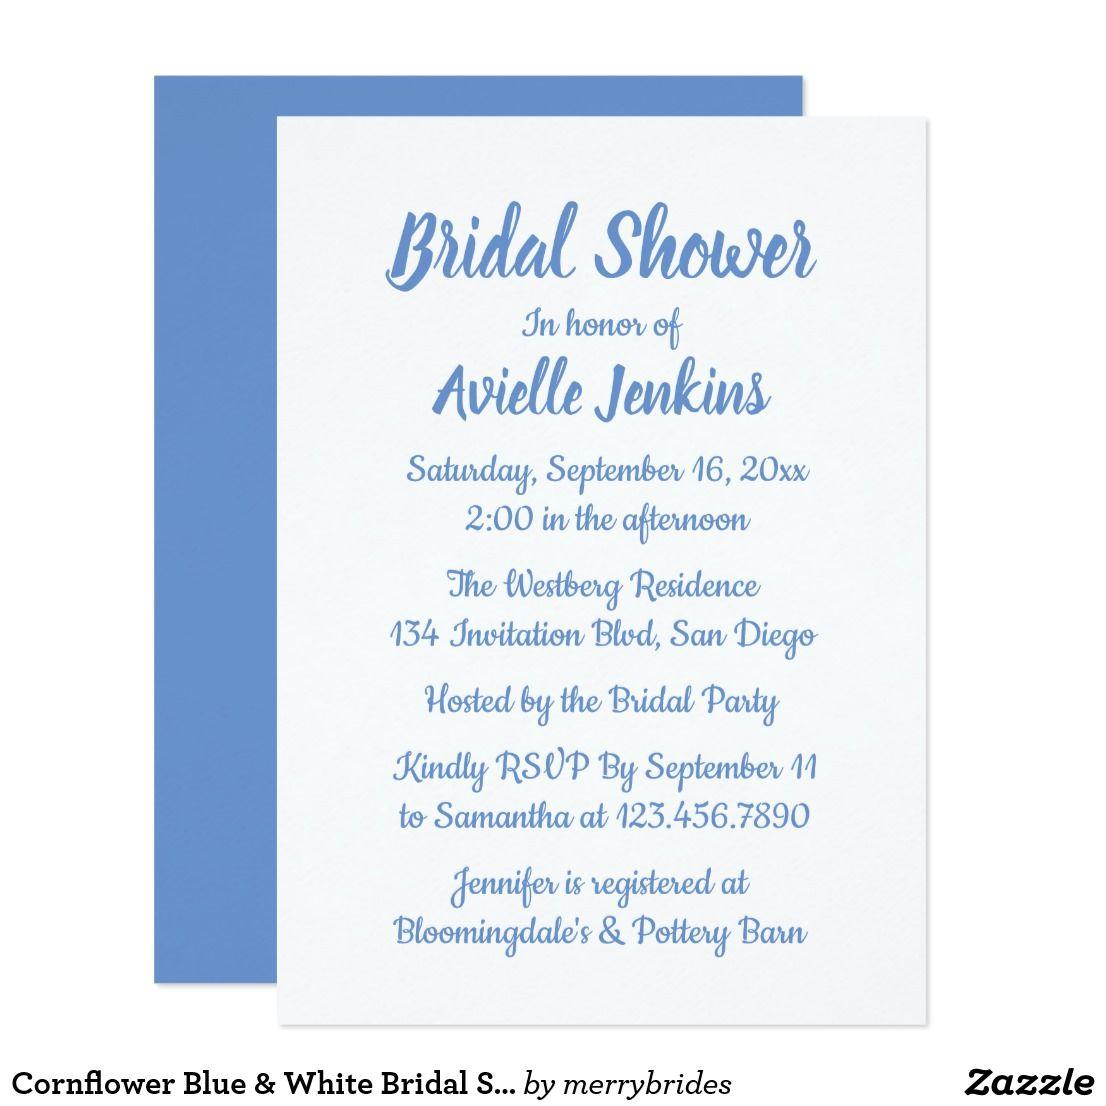 Cornflower Blue & White Bridal Shower Wedding Card | White bridal ...